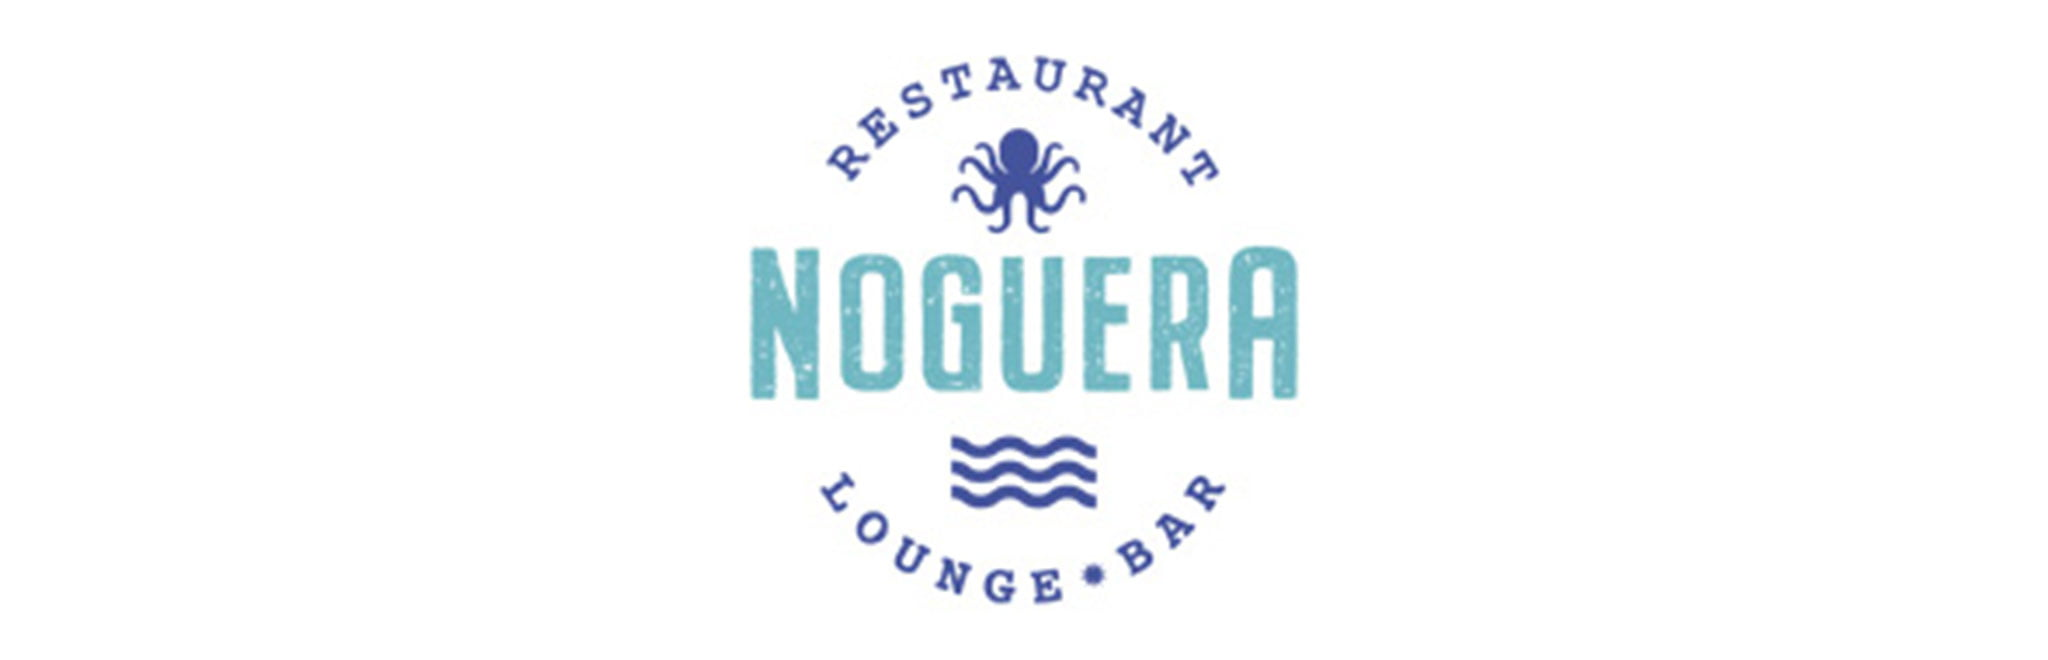 Logotipo de Restaurant Noguera